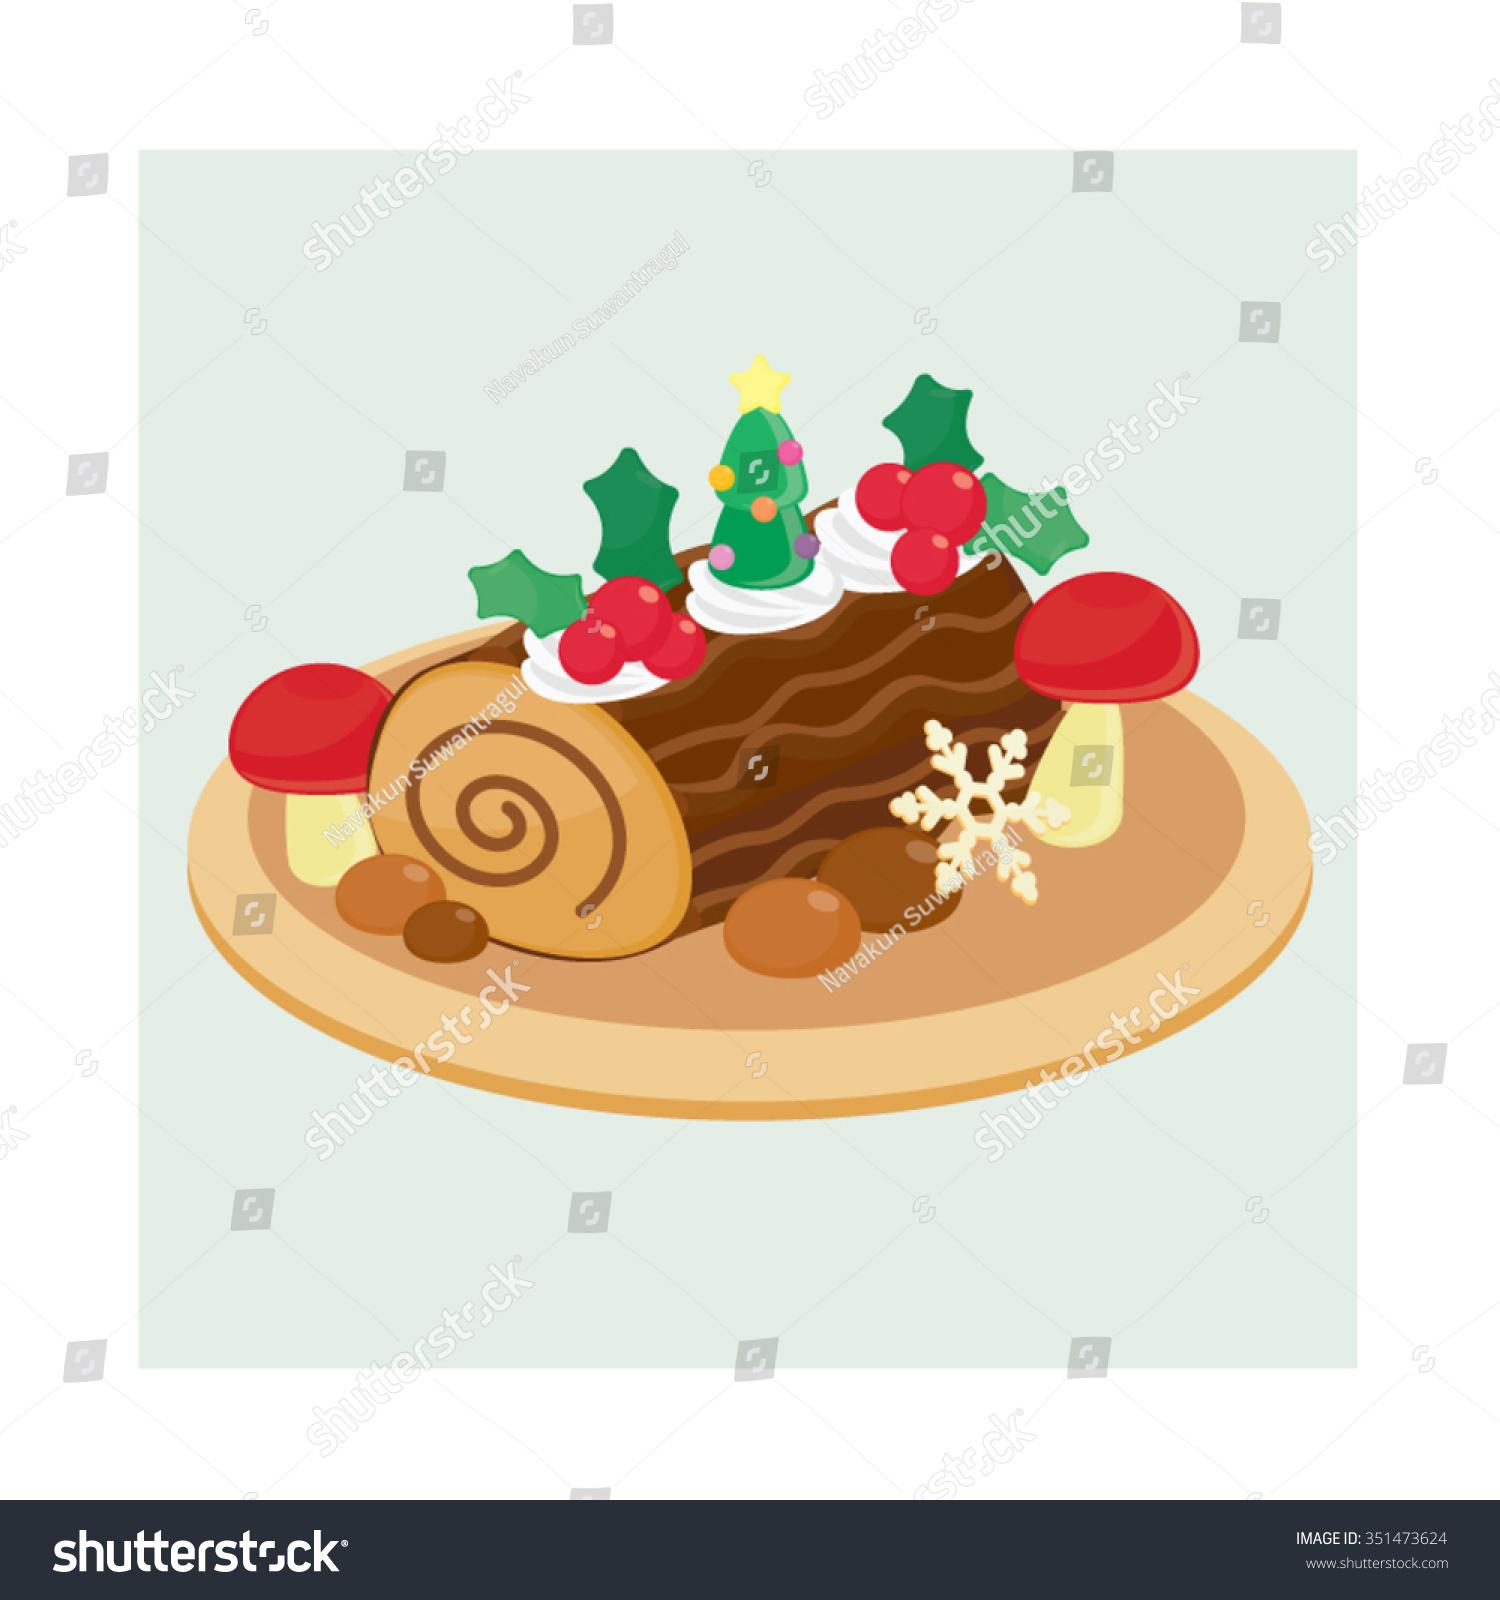 Christmas Yule Log Stock Vector (Royalty Free) 351473624 - Shutterstock